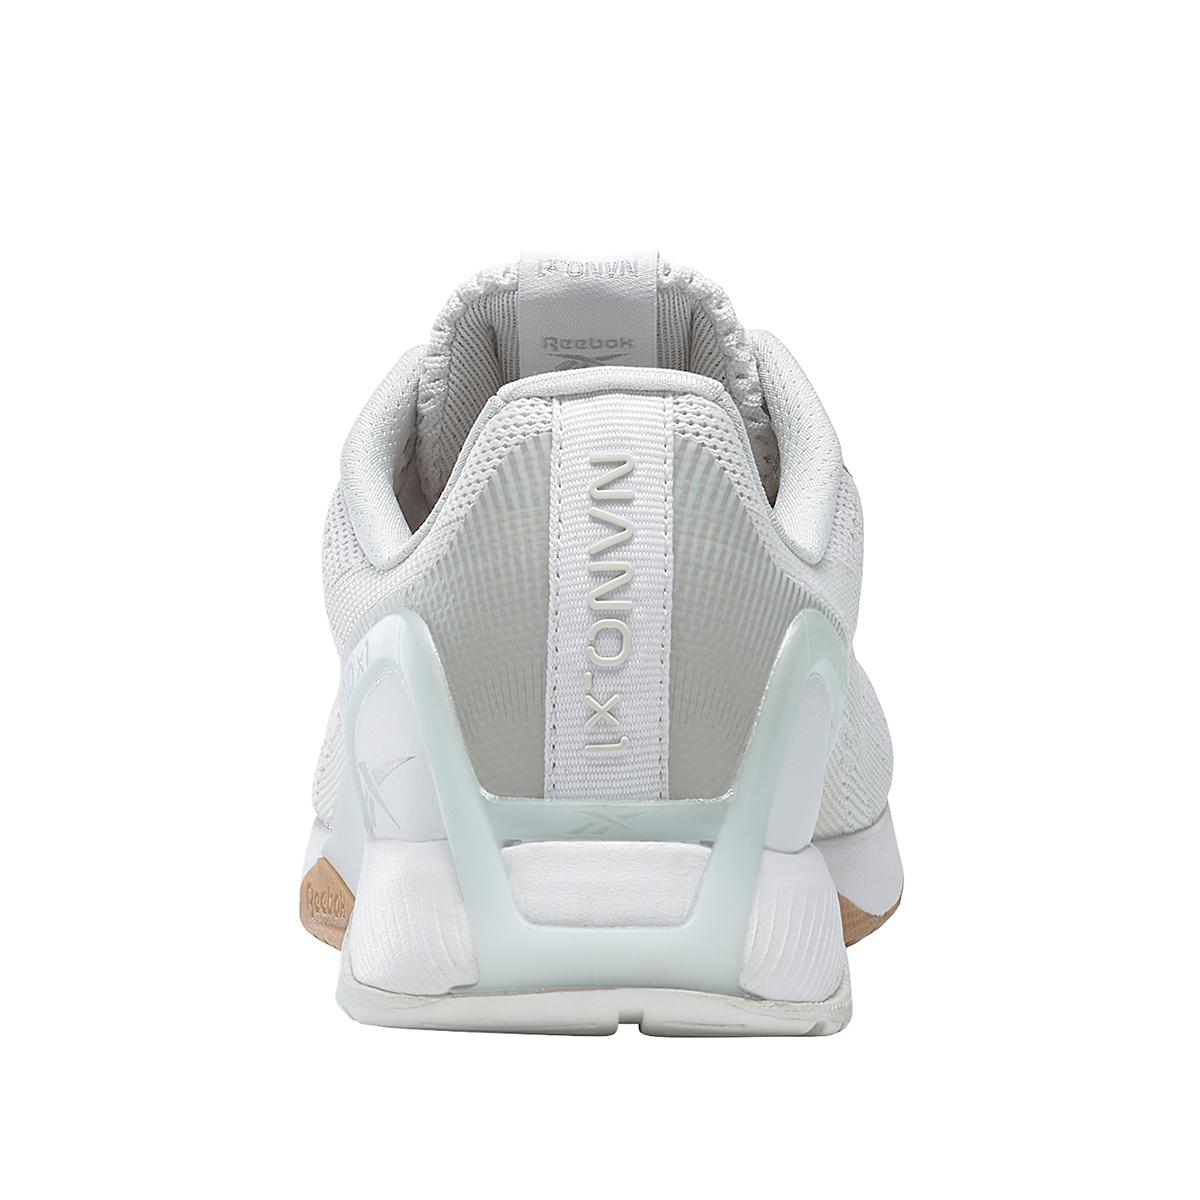 Women's Reebok Nano X1 Training Shoe - Color: White/True Grey/Rubber Gum - Size: 5 - Width: Regular, White/True Grey/Rubber Gum, large, image 6